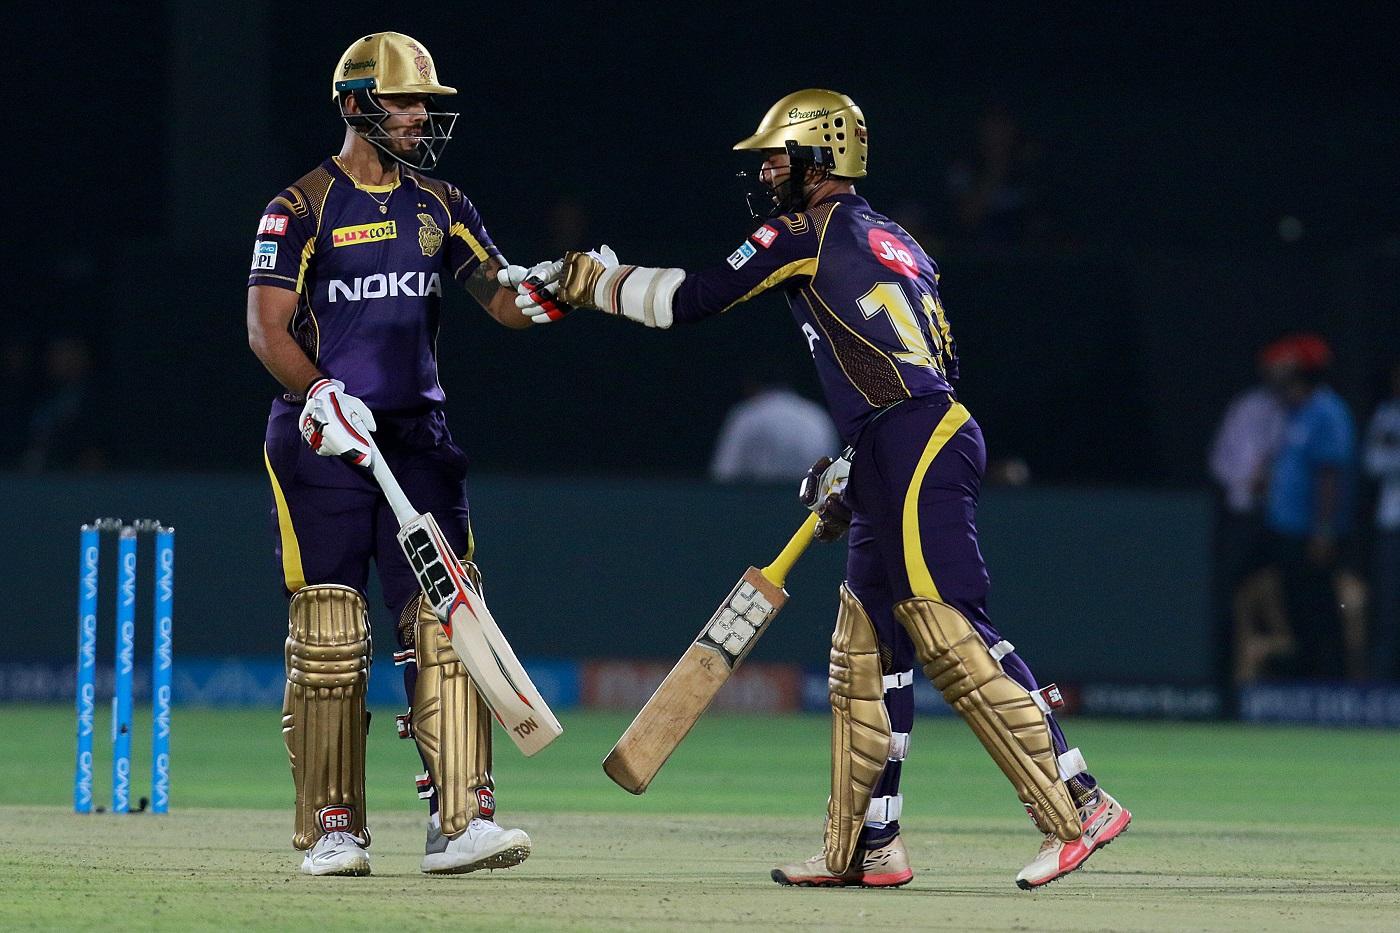 IPL 2018: Robin Uthappa Opens Up on Differences in Captaincy of Gautam Gambhir & Dinesh Karthik 1